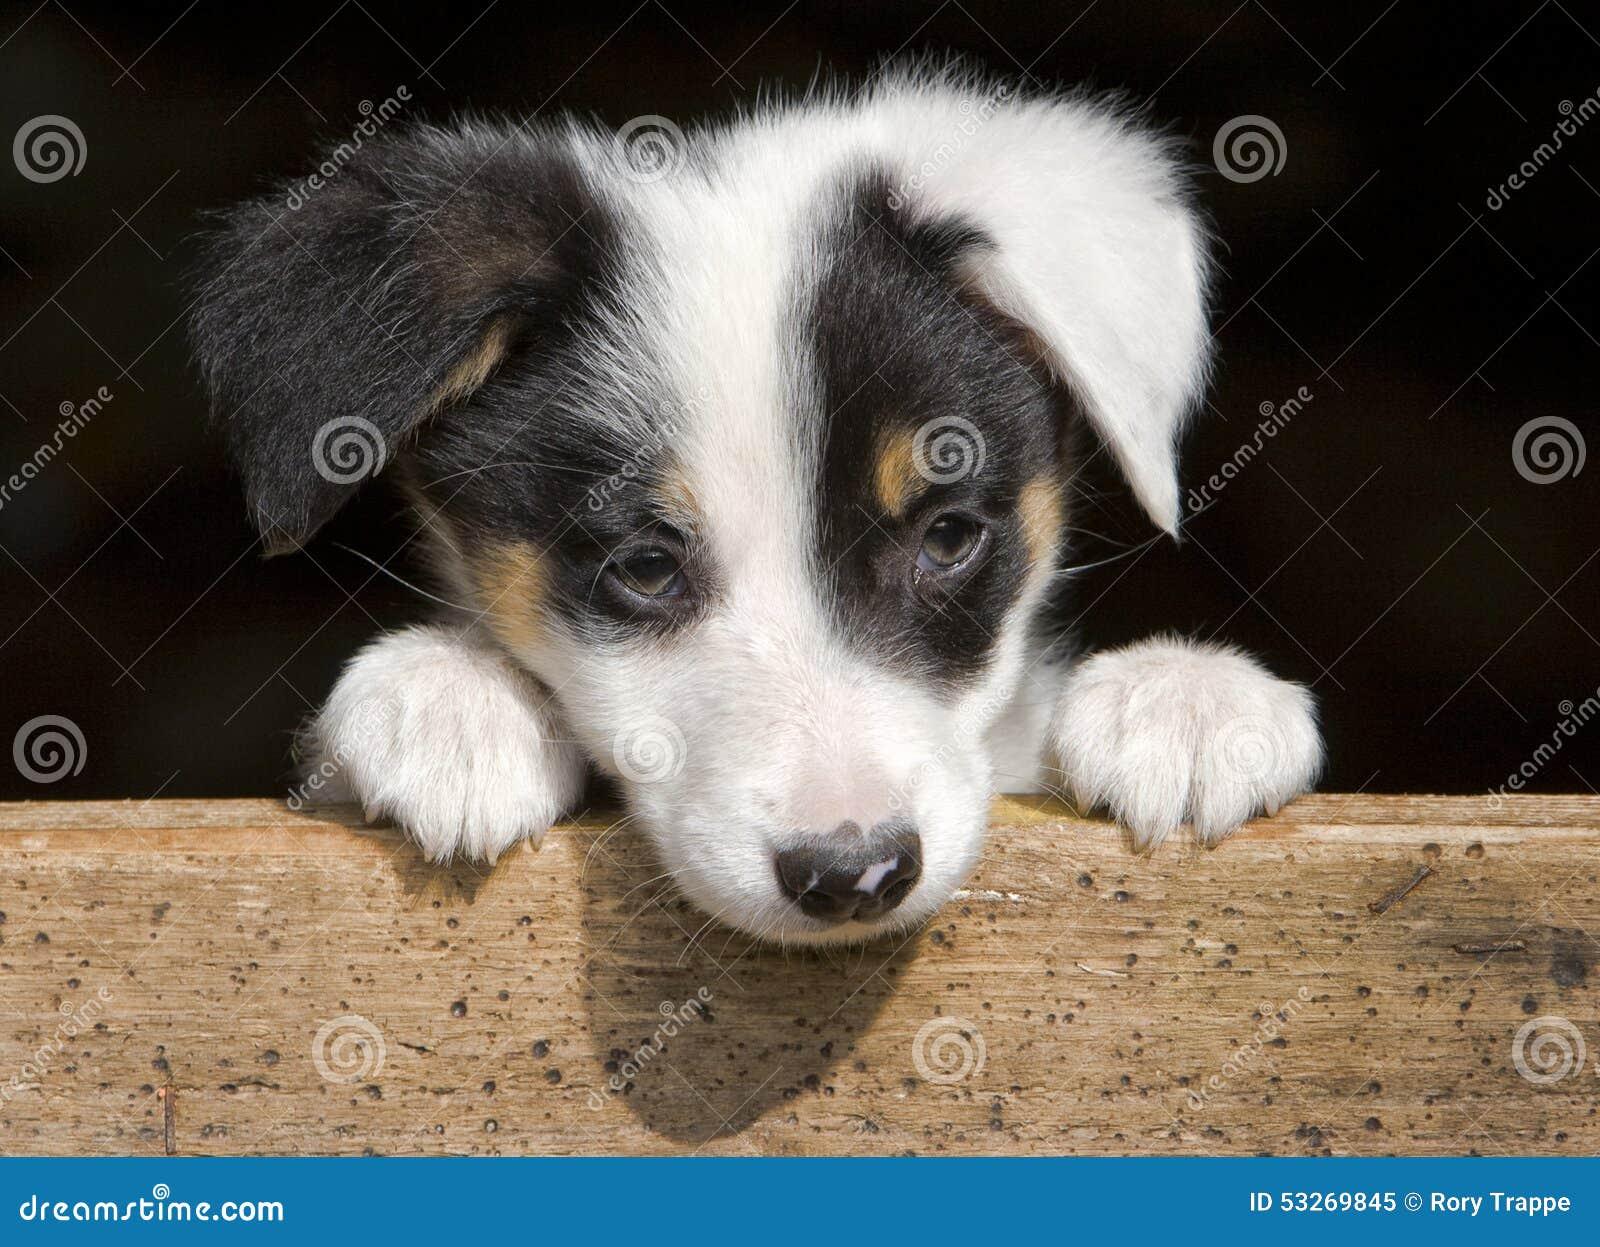 Sheep dog puppy